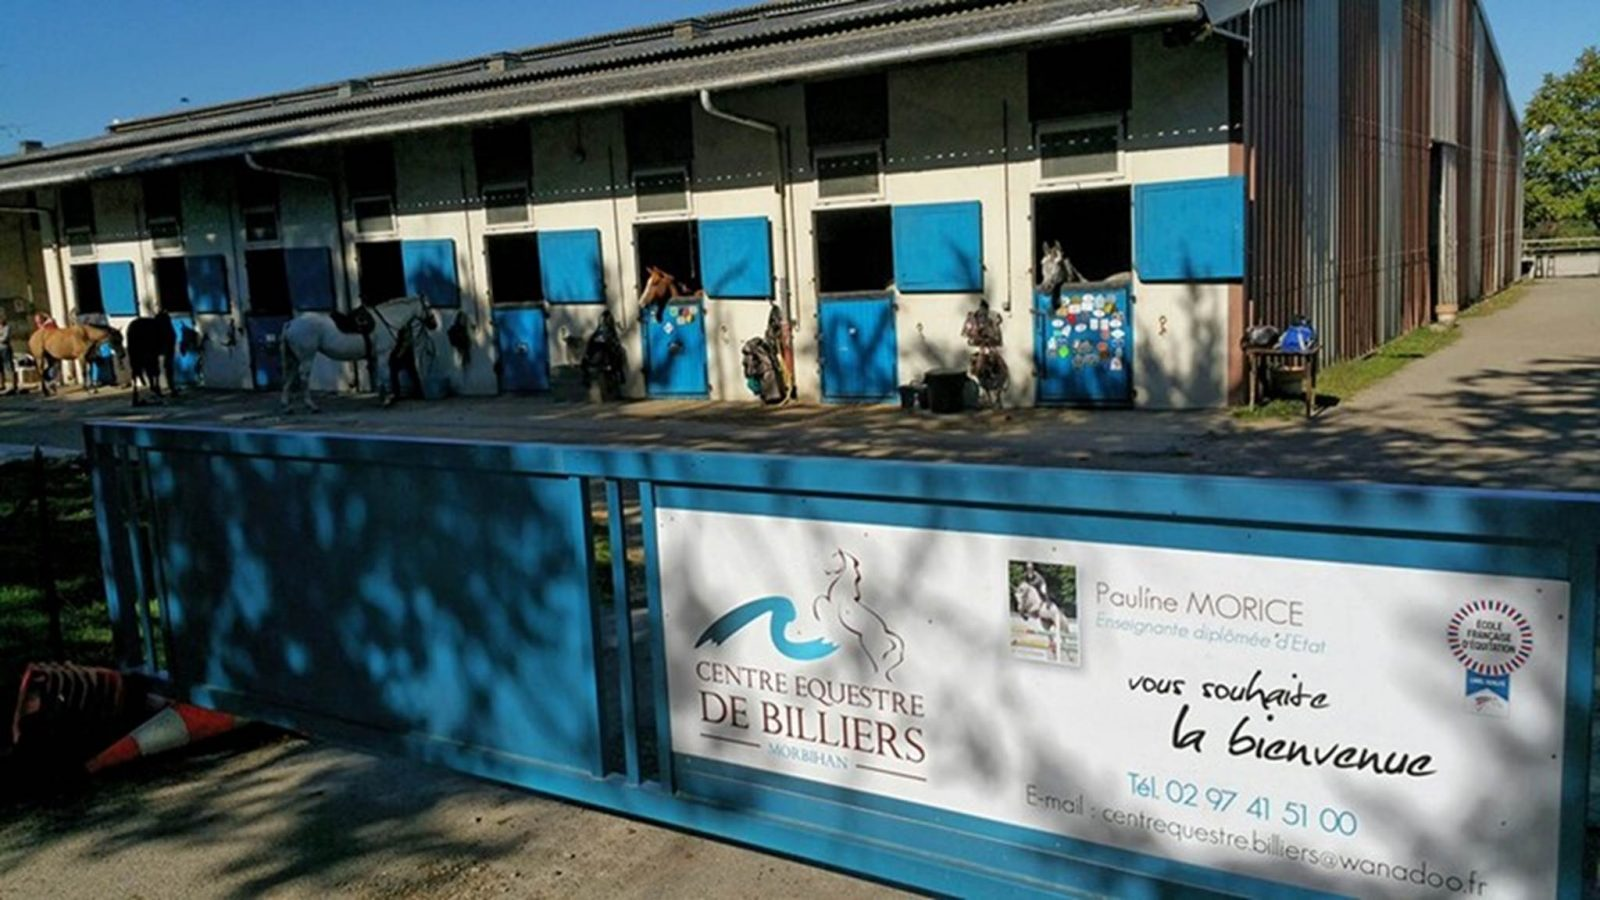 Centre équestre de Billiers Morbihan